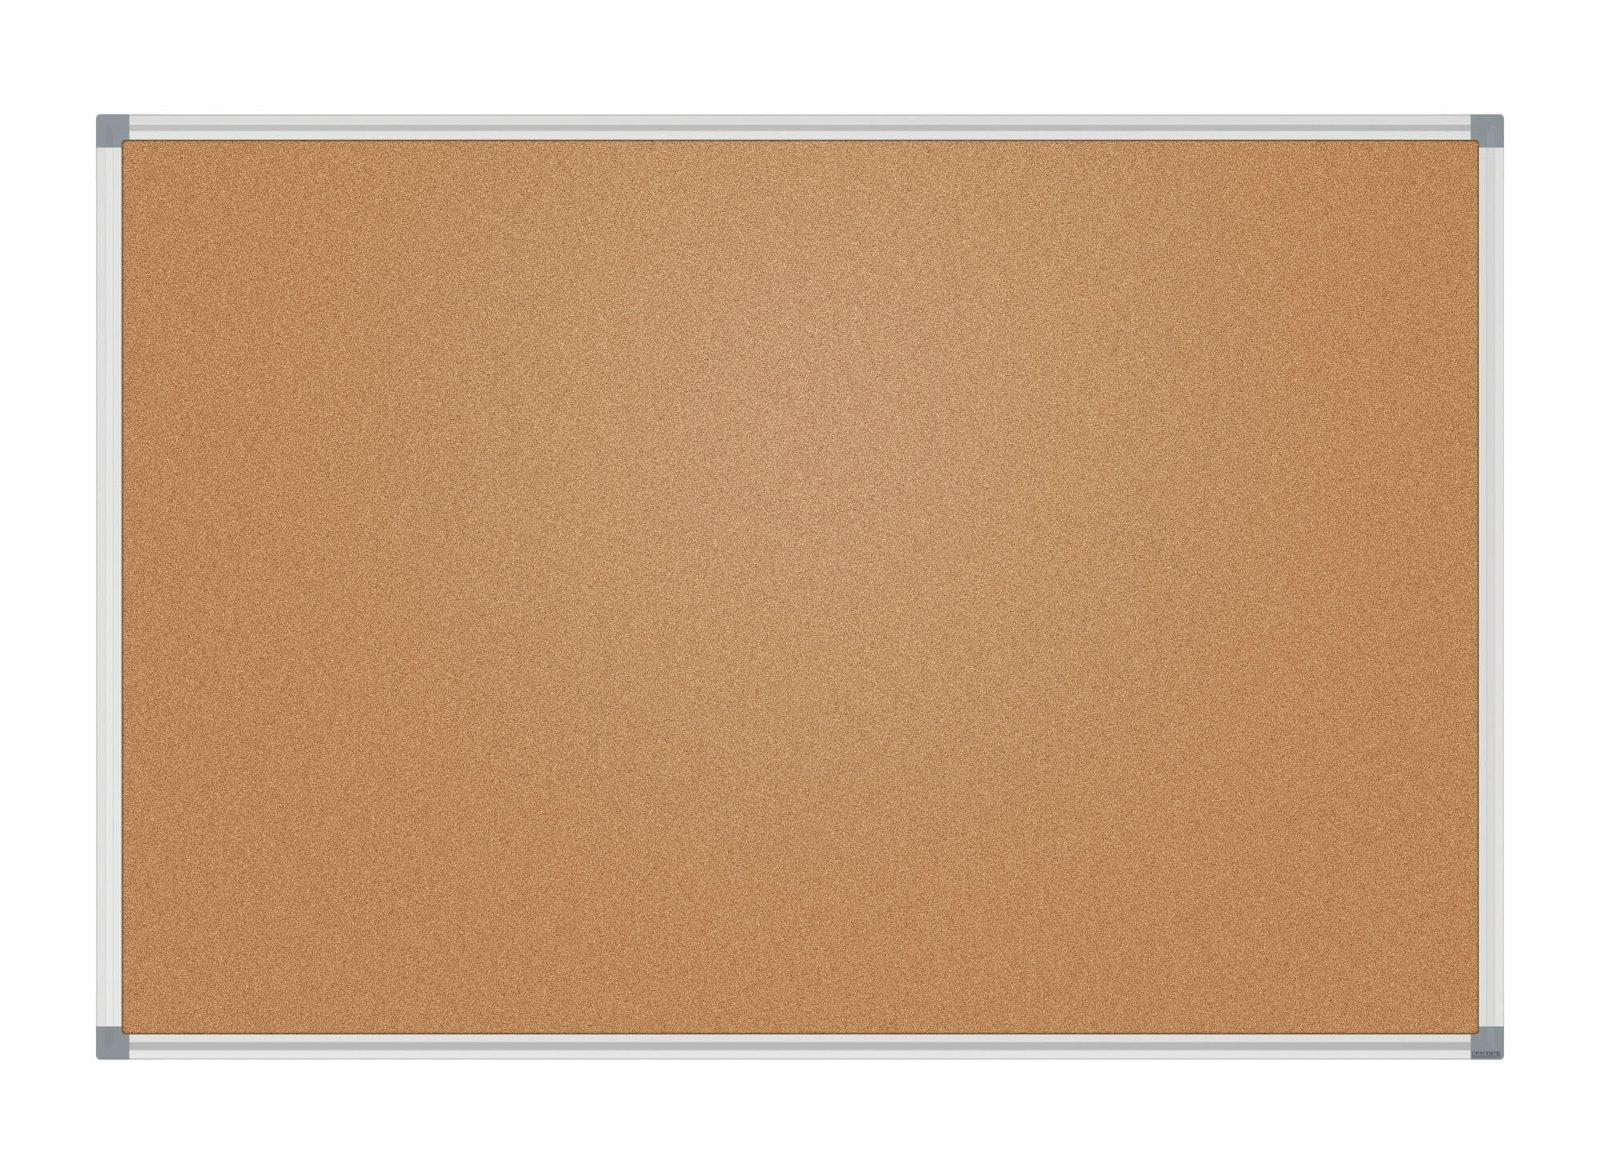 Pinnboard MAULstandard, 60x90 cm, Kork, SB-Verpackung, grau